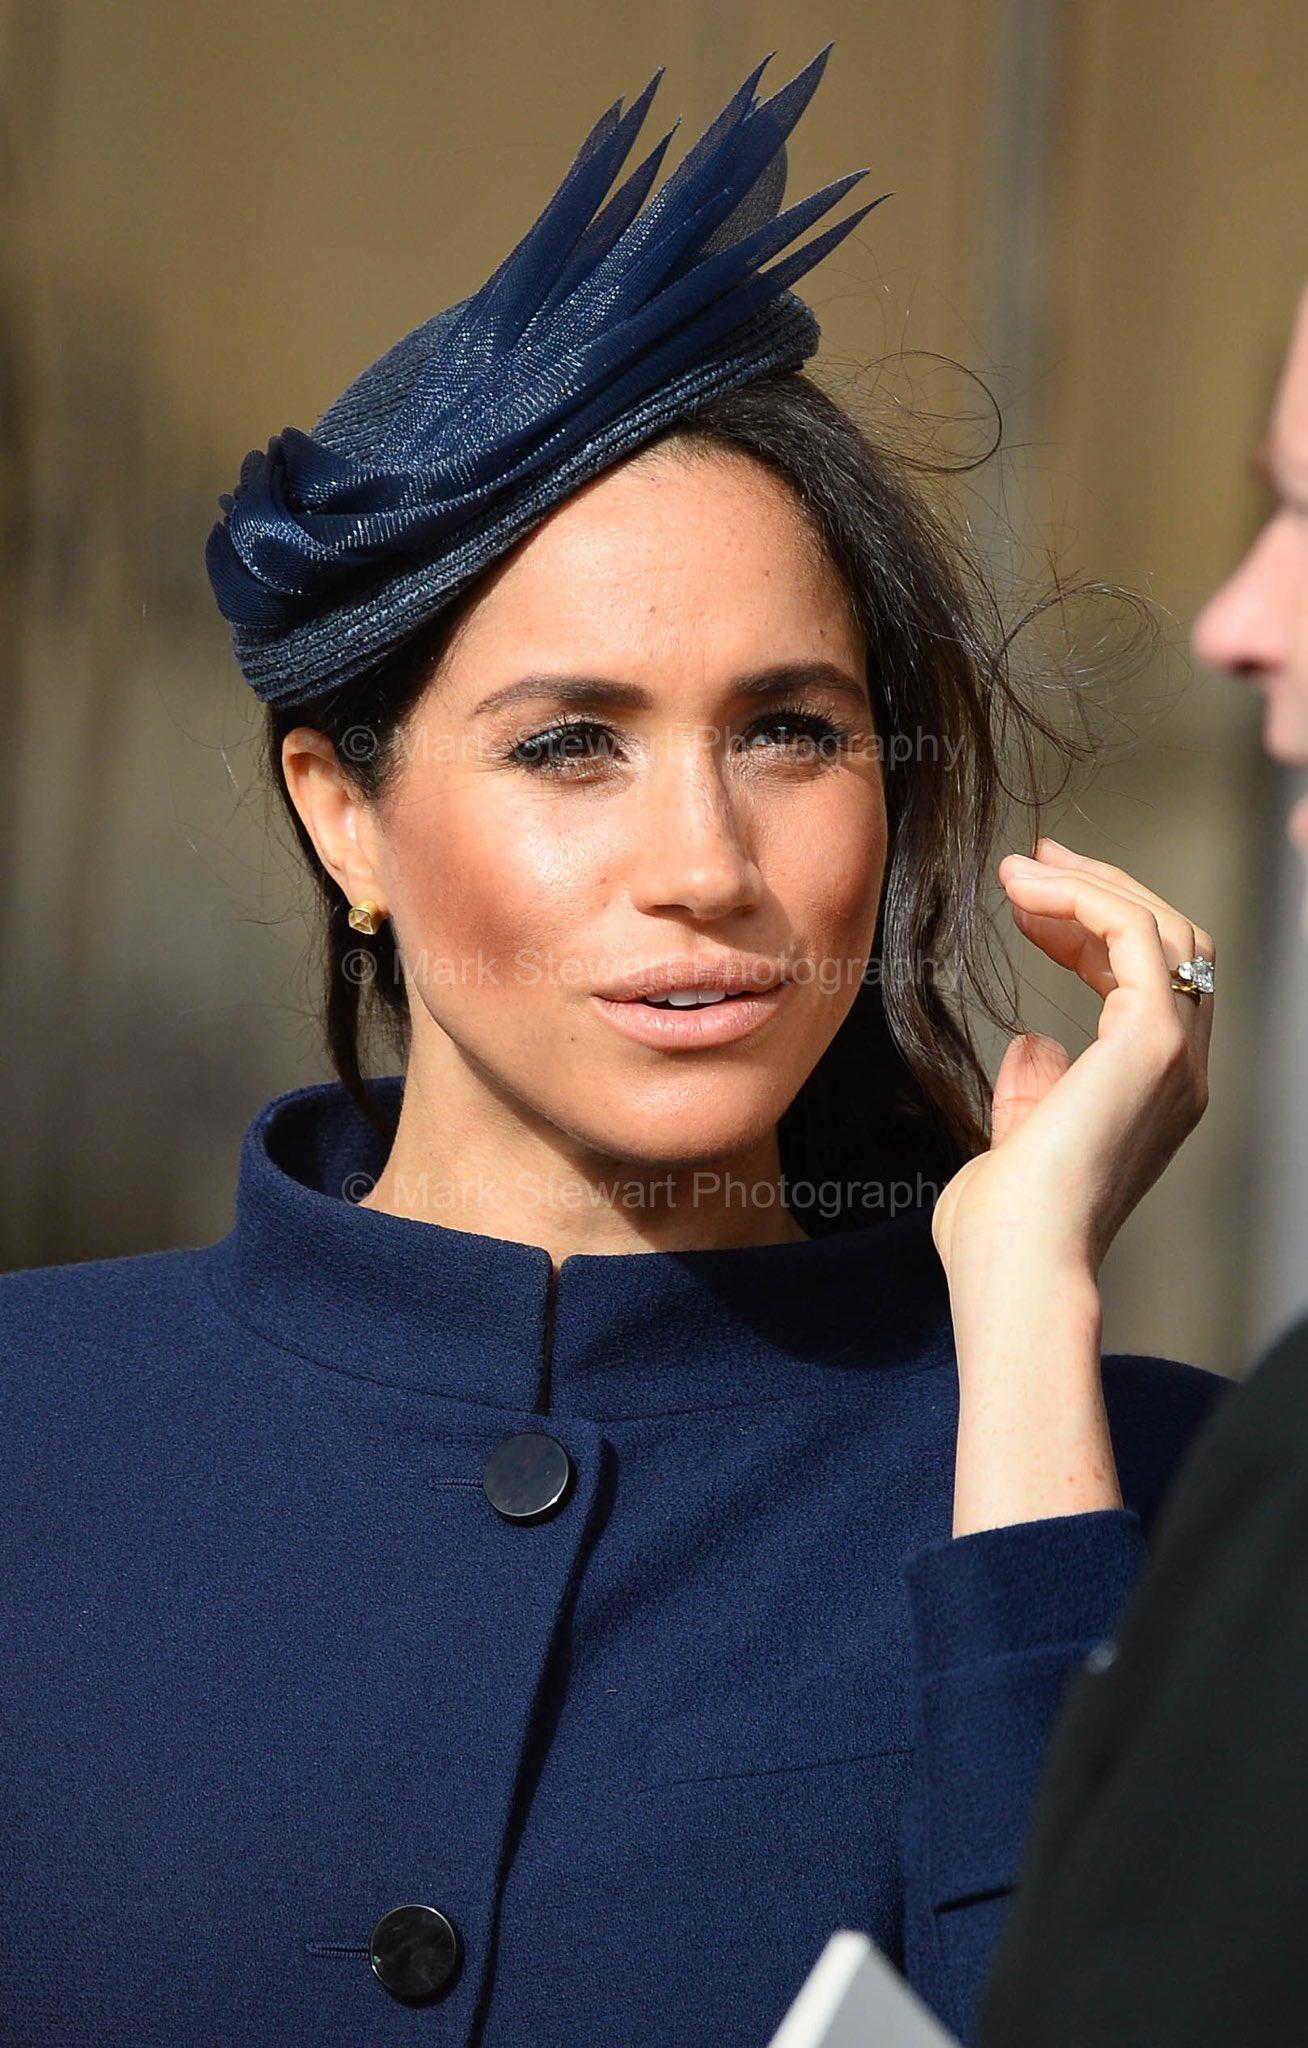 The Duchess of Sussex at today's #RoyalWedding https://t.co/vlc75ttTlk